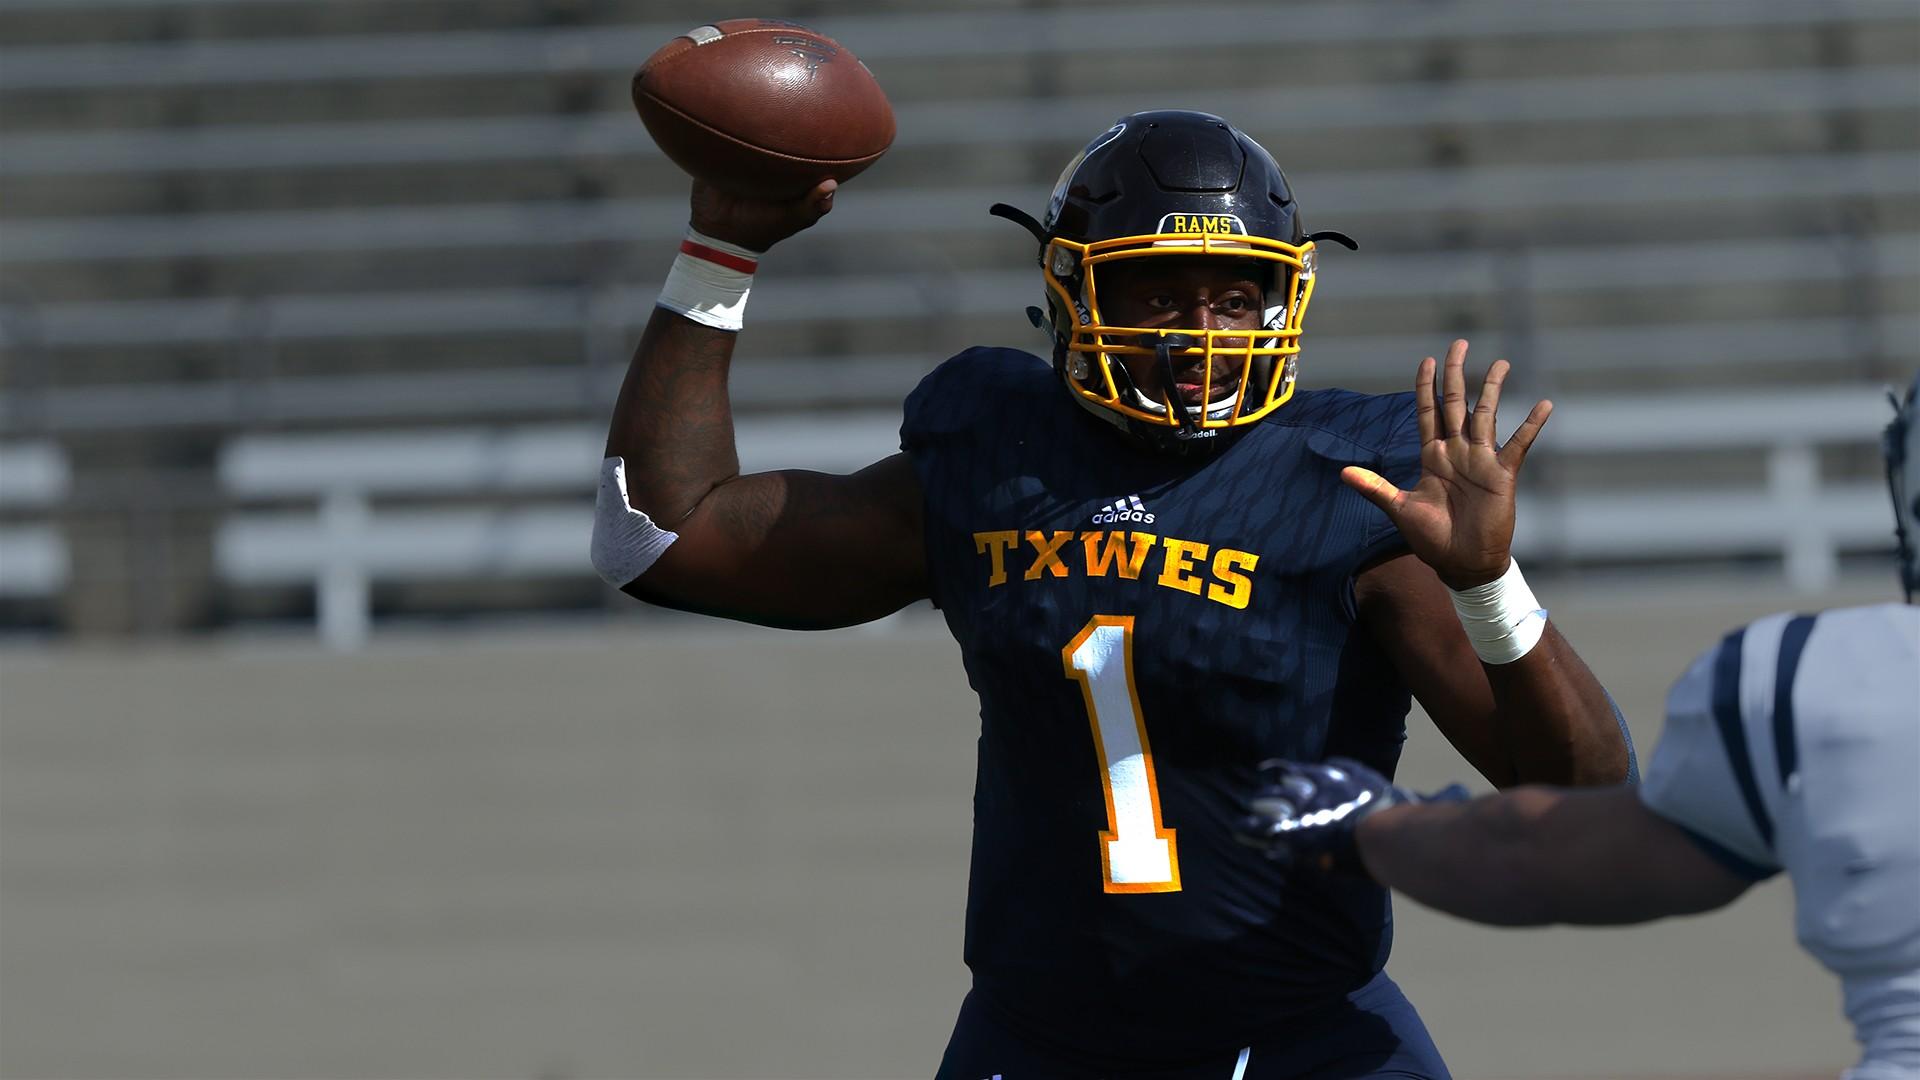 Meet 2020 Nfl Draft Prospect Donovan Isom Qb Texas Wesleyan